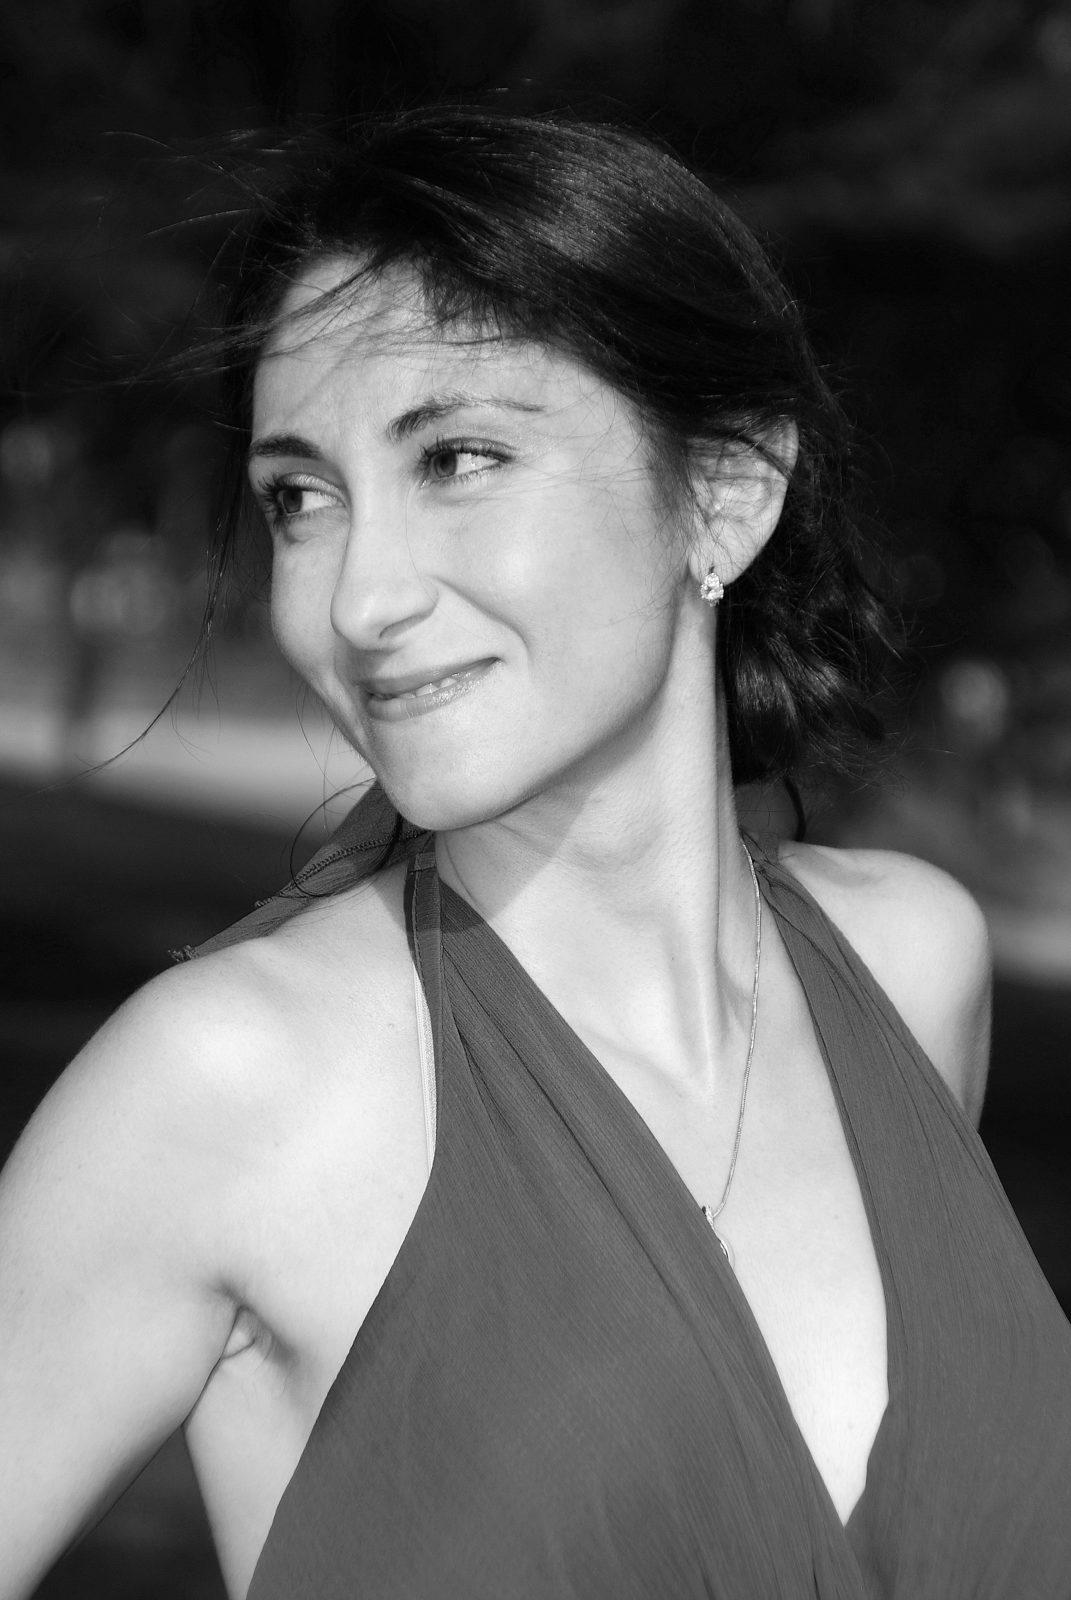 Entrevista a nuestra alumna Ruth Simón